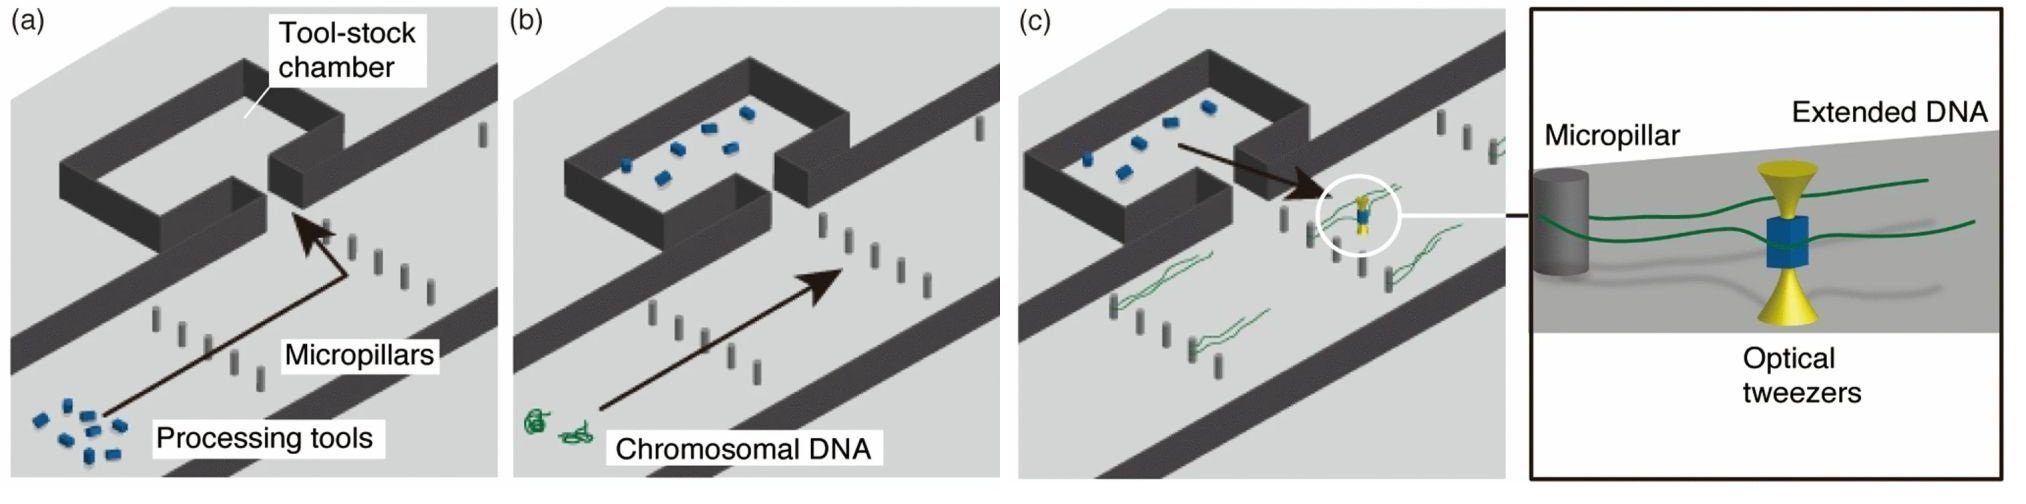 Microfluidic Workbench